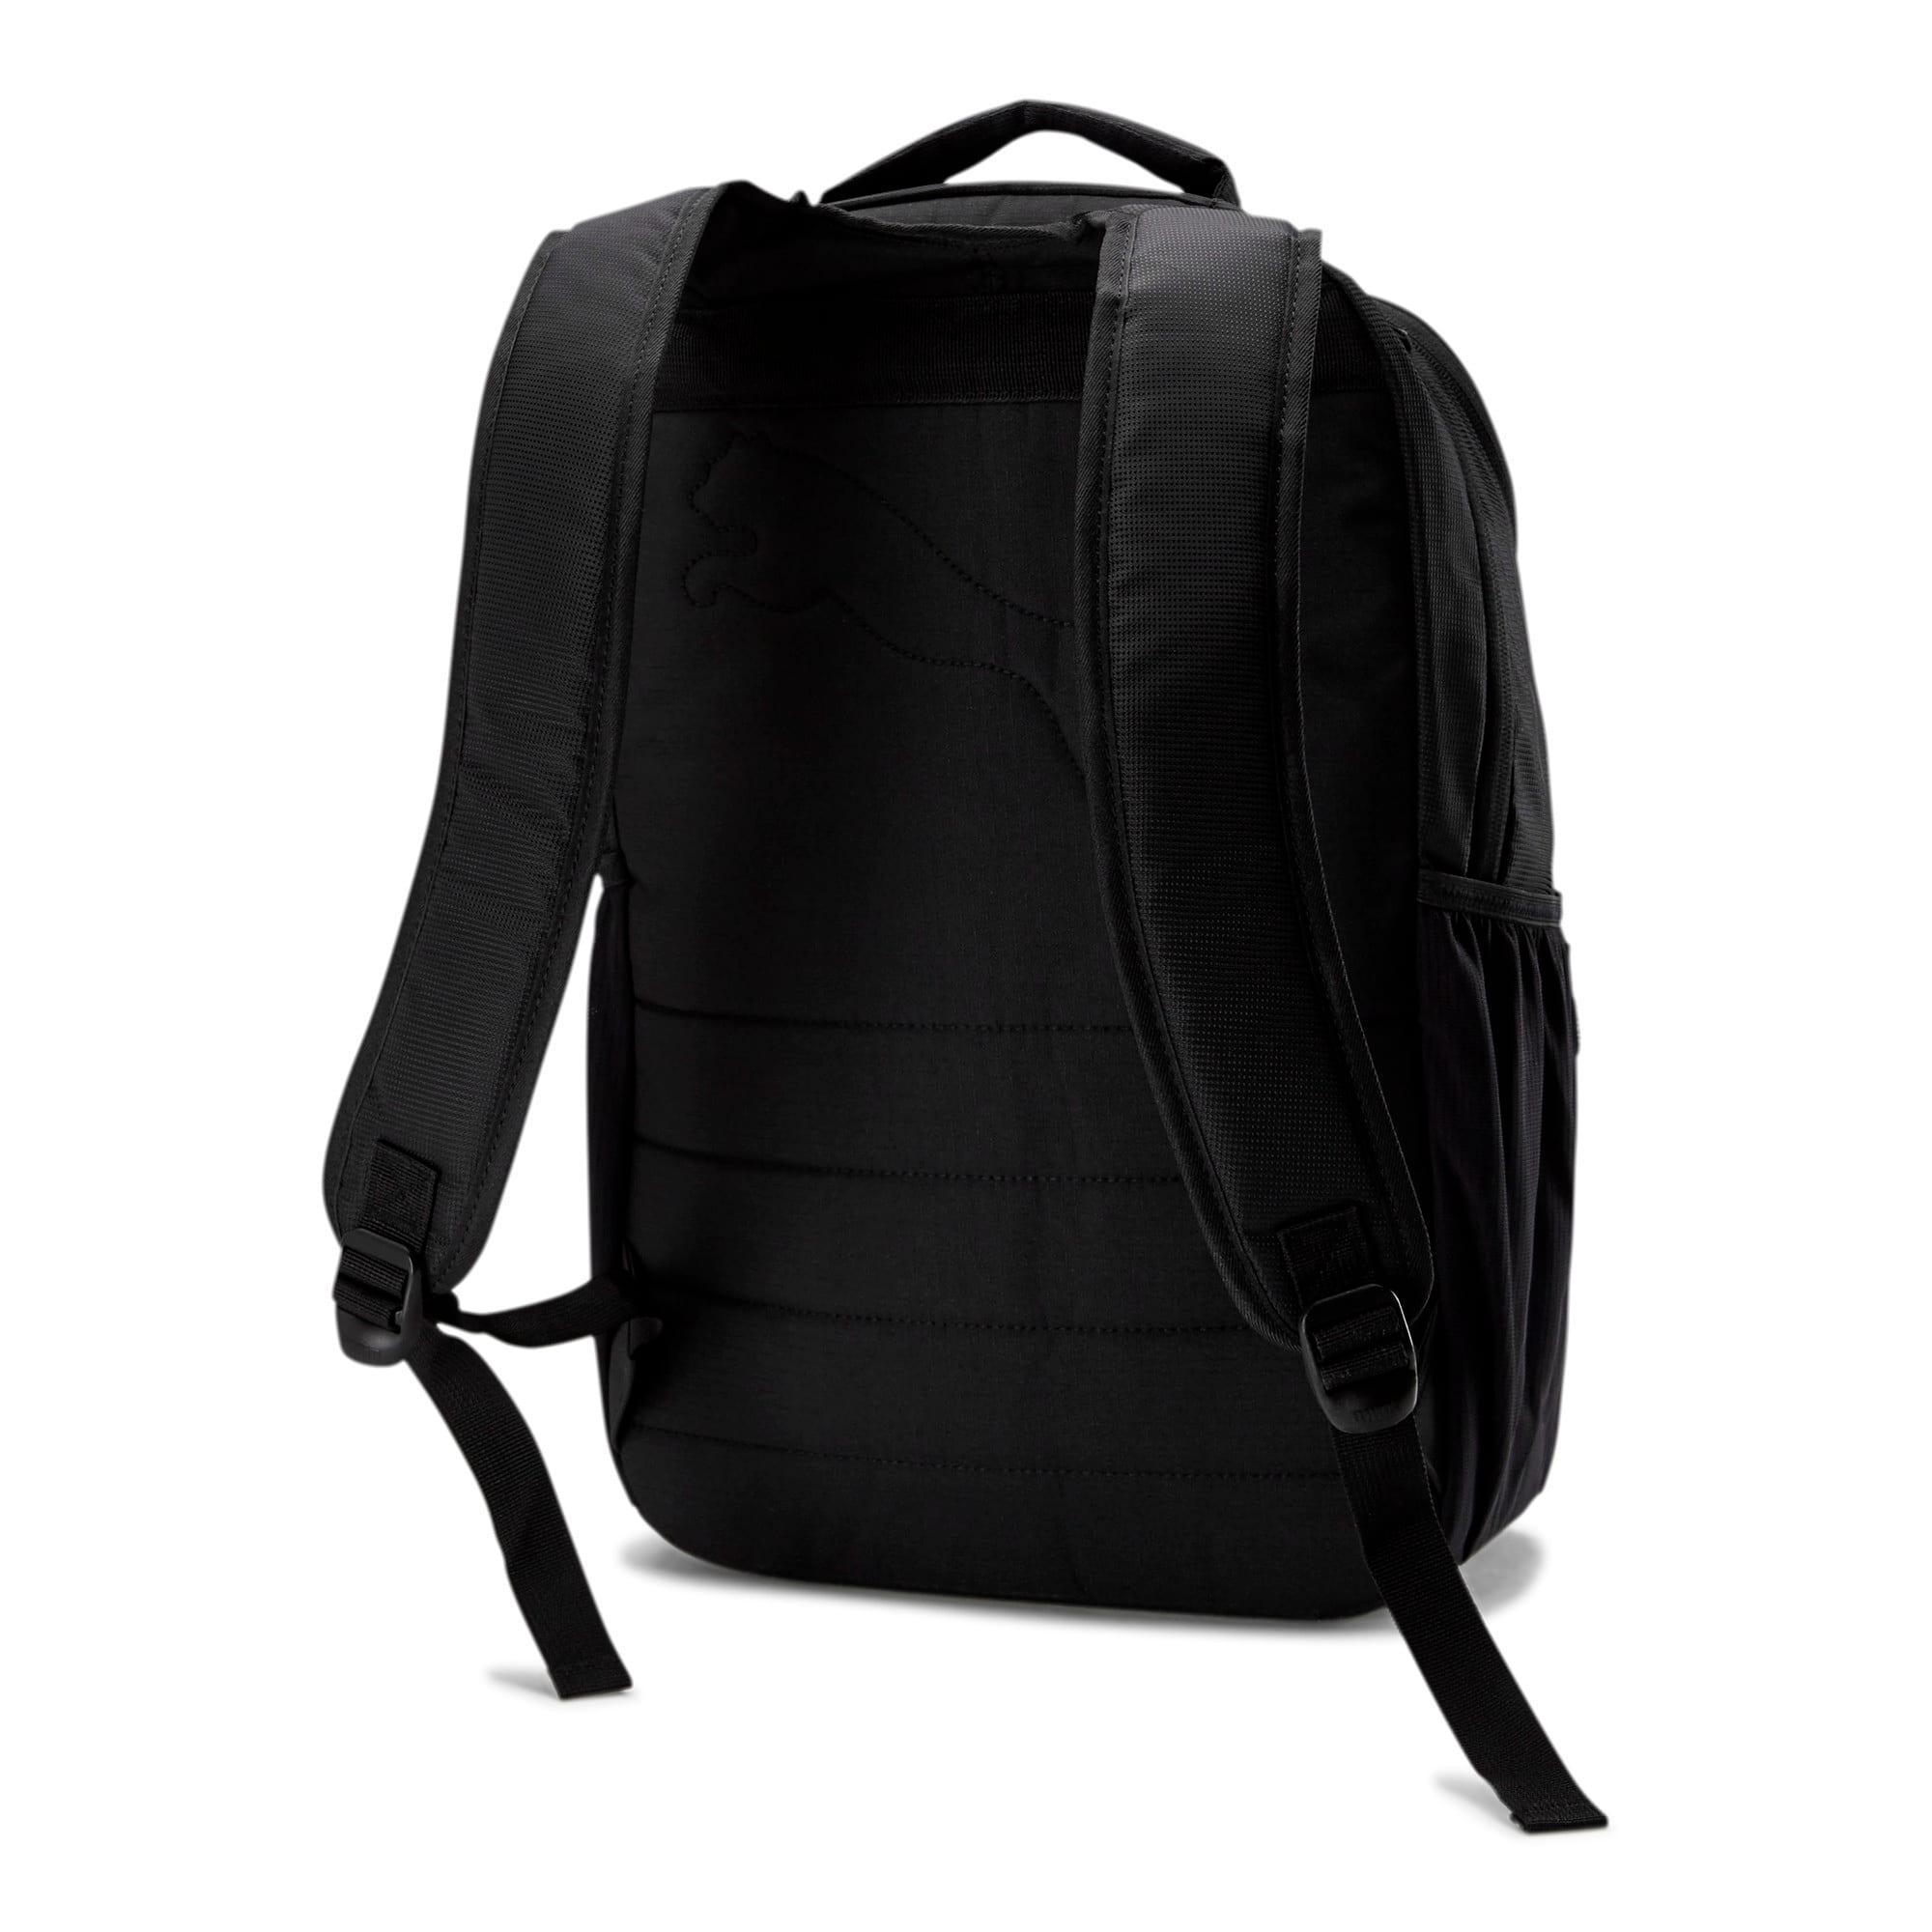 Thumbnail 2 of Formation 2.0 Ball Backpack, Black, medium